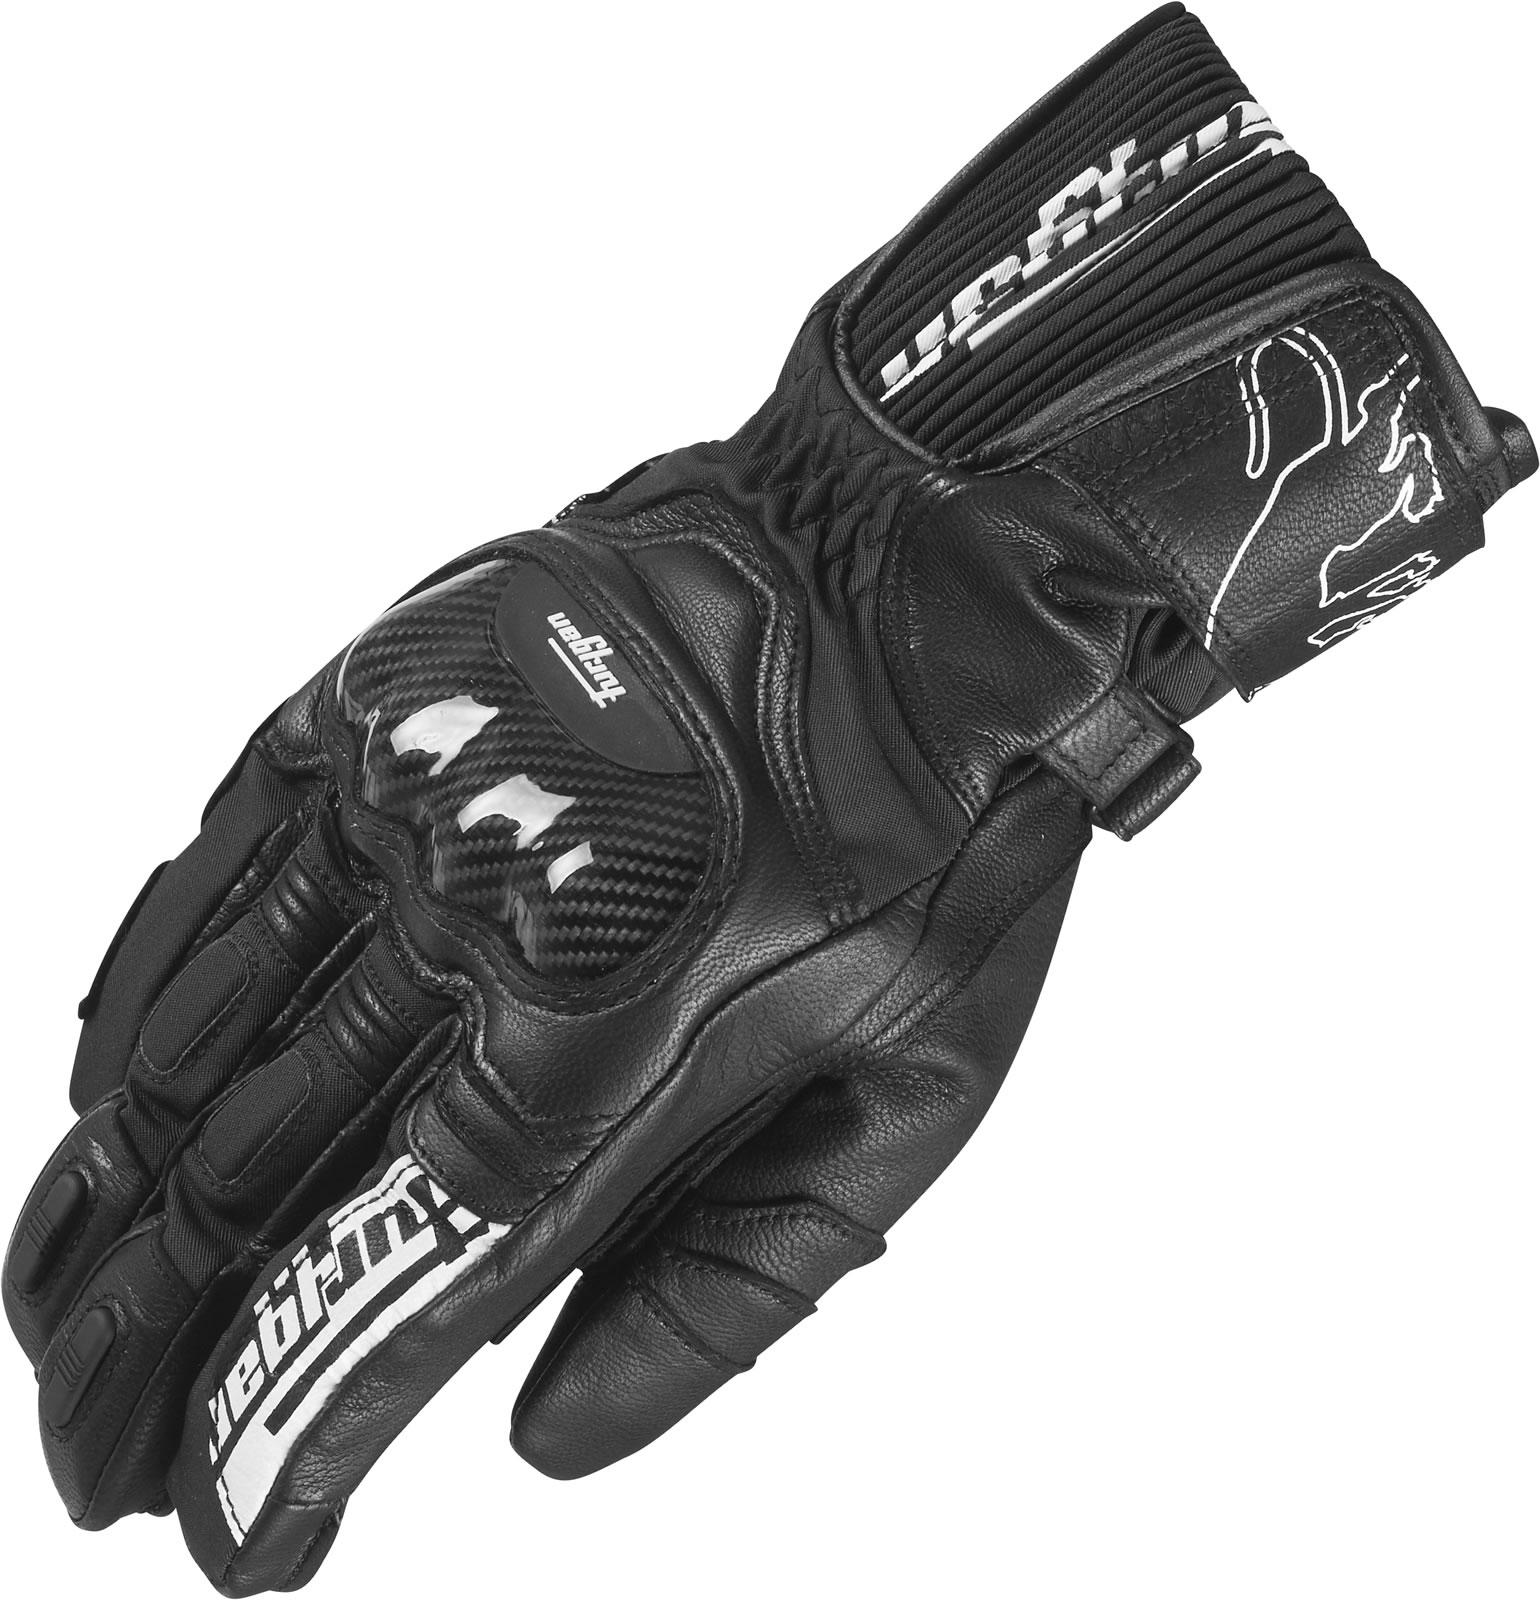 Motorcycle gloves all season - Furygan Mercury Sympatex Leather Motorcycle Gloves All Season